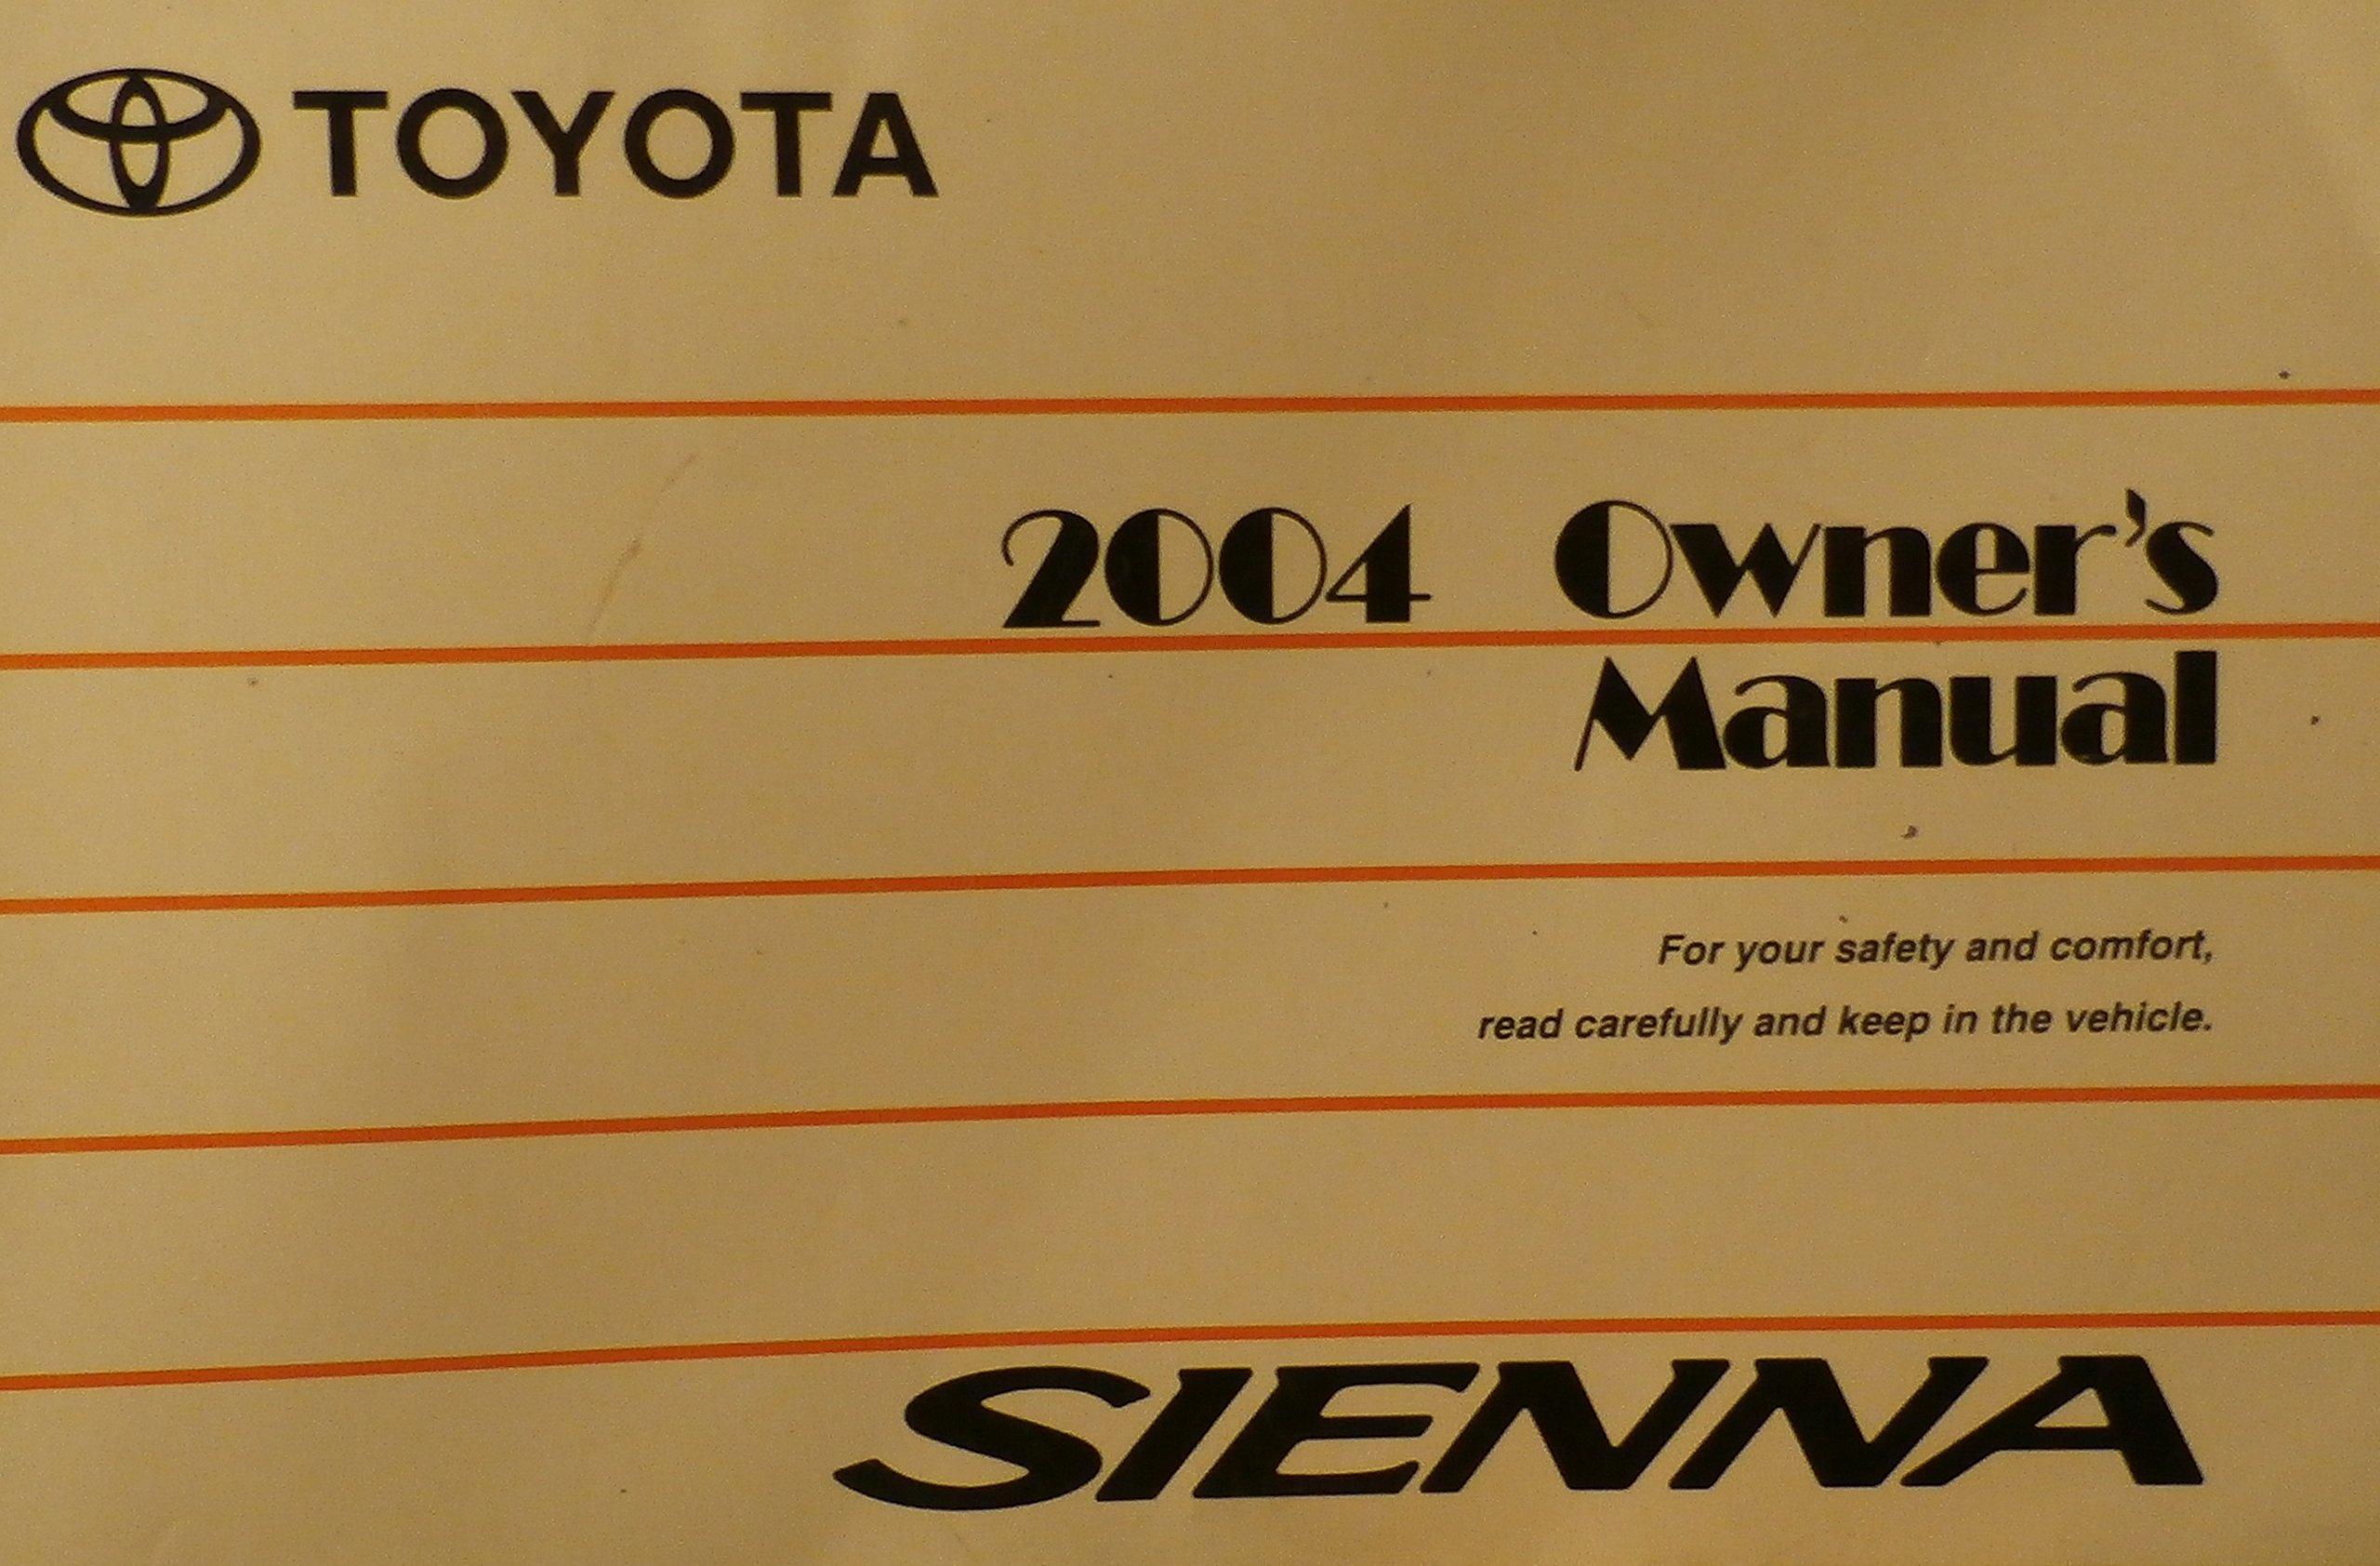 2004 toyota sienna service manual